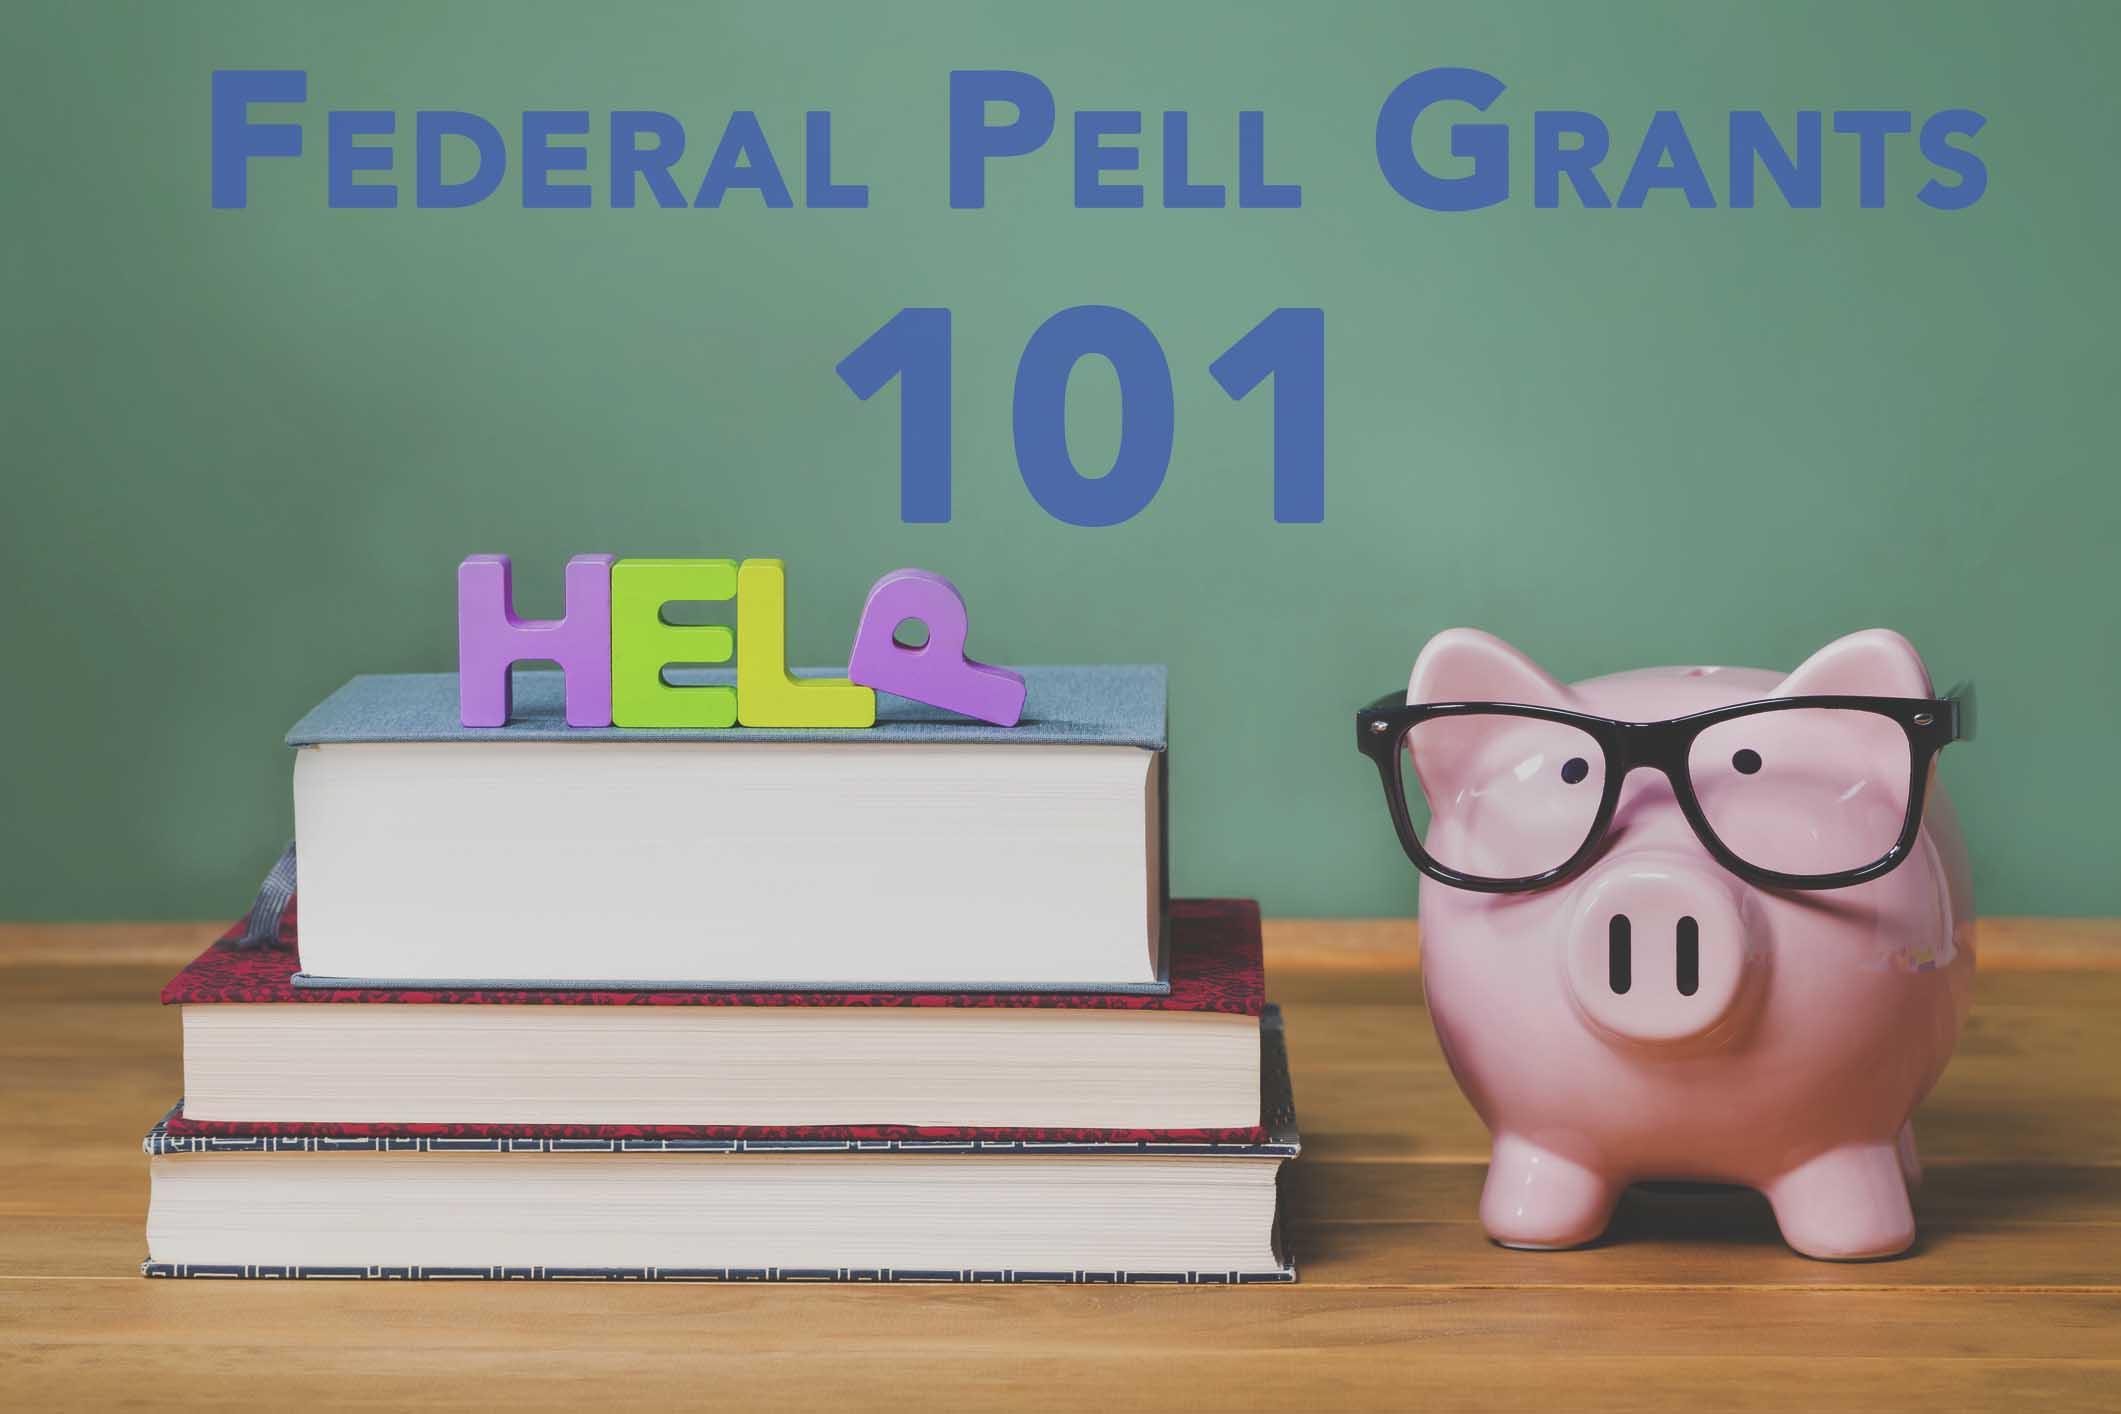 Federal Pell Grants